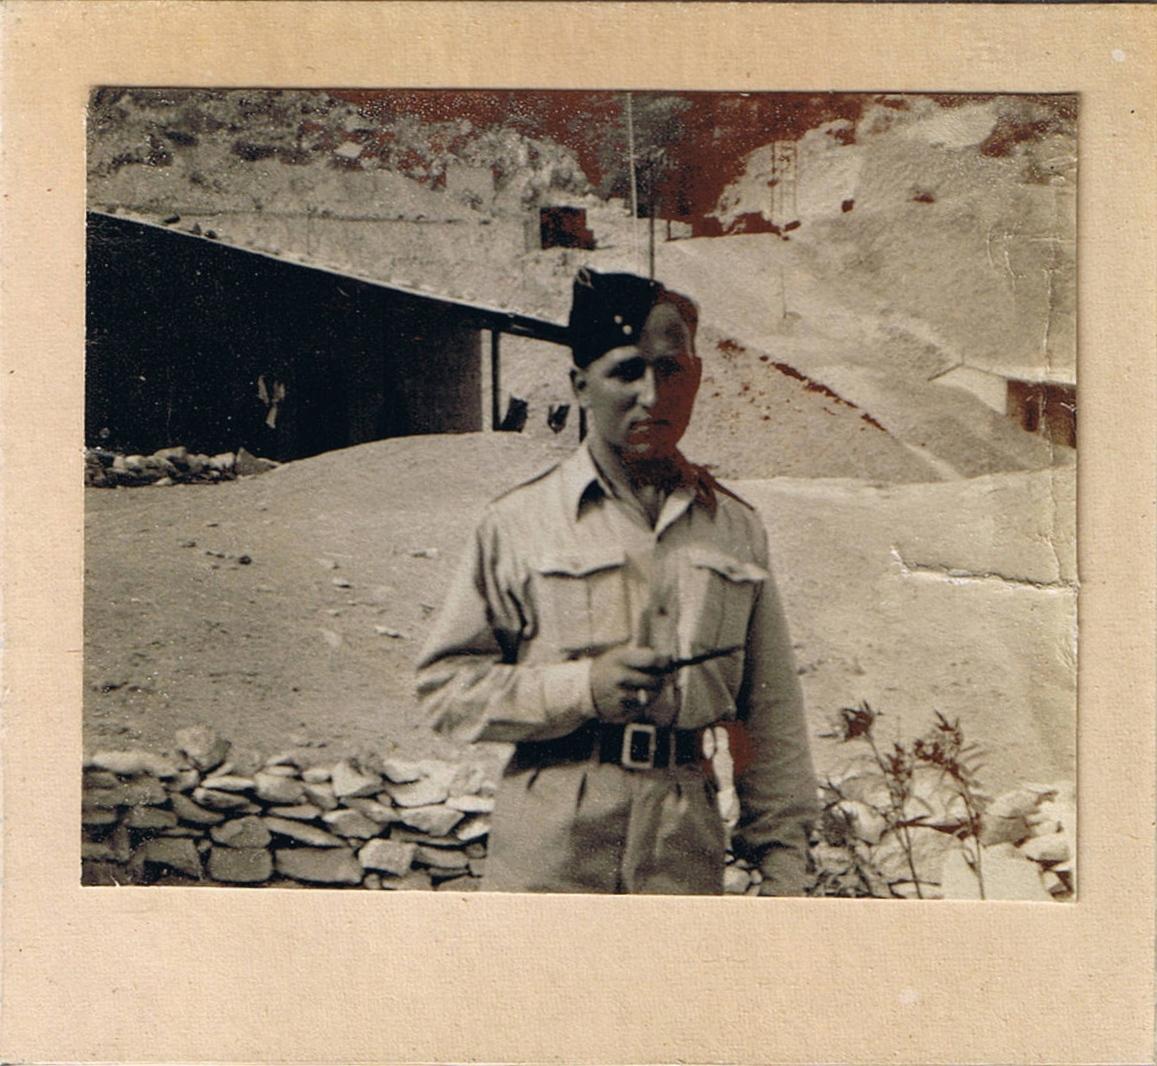 As a Sapper in the 8th Army